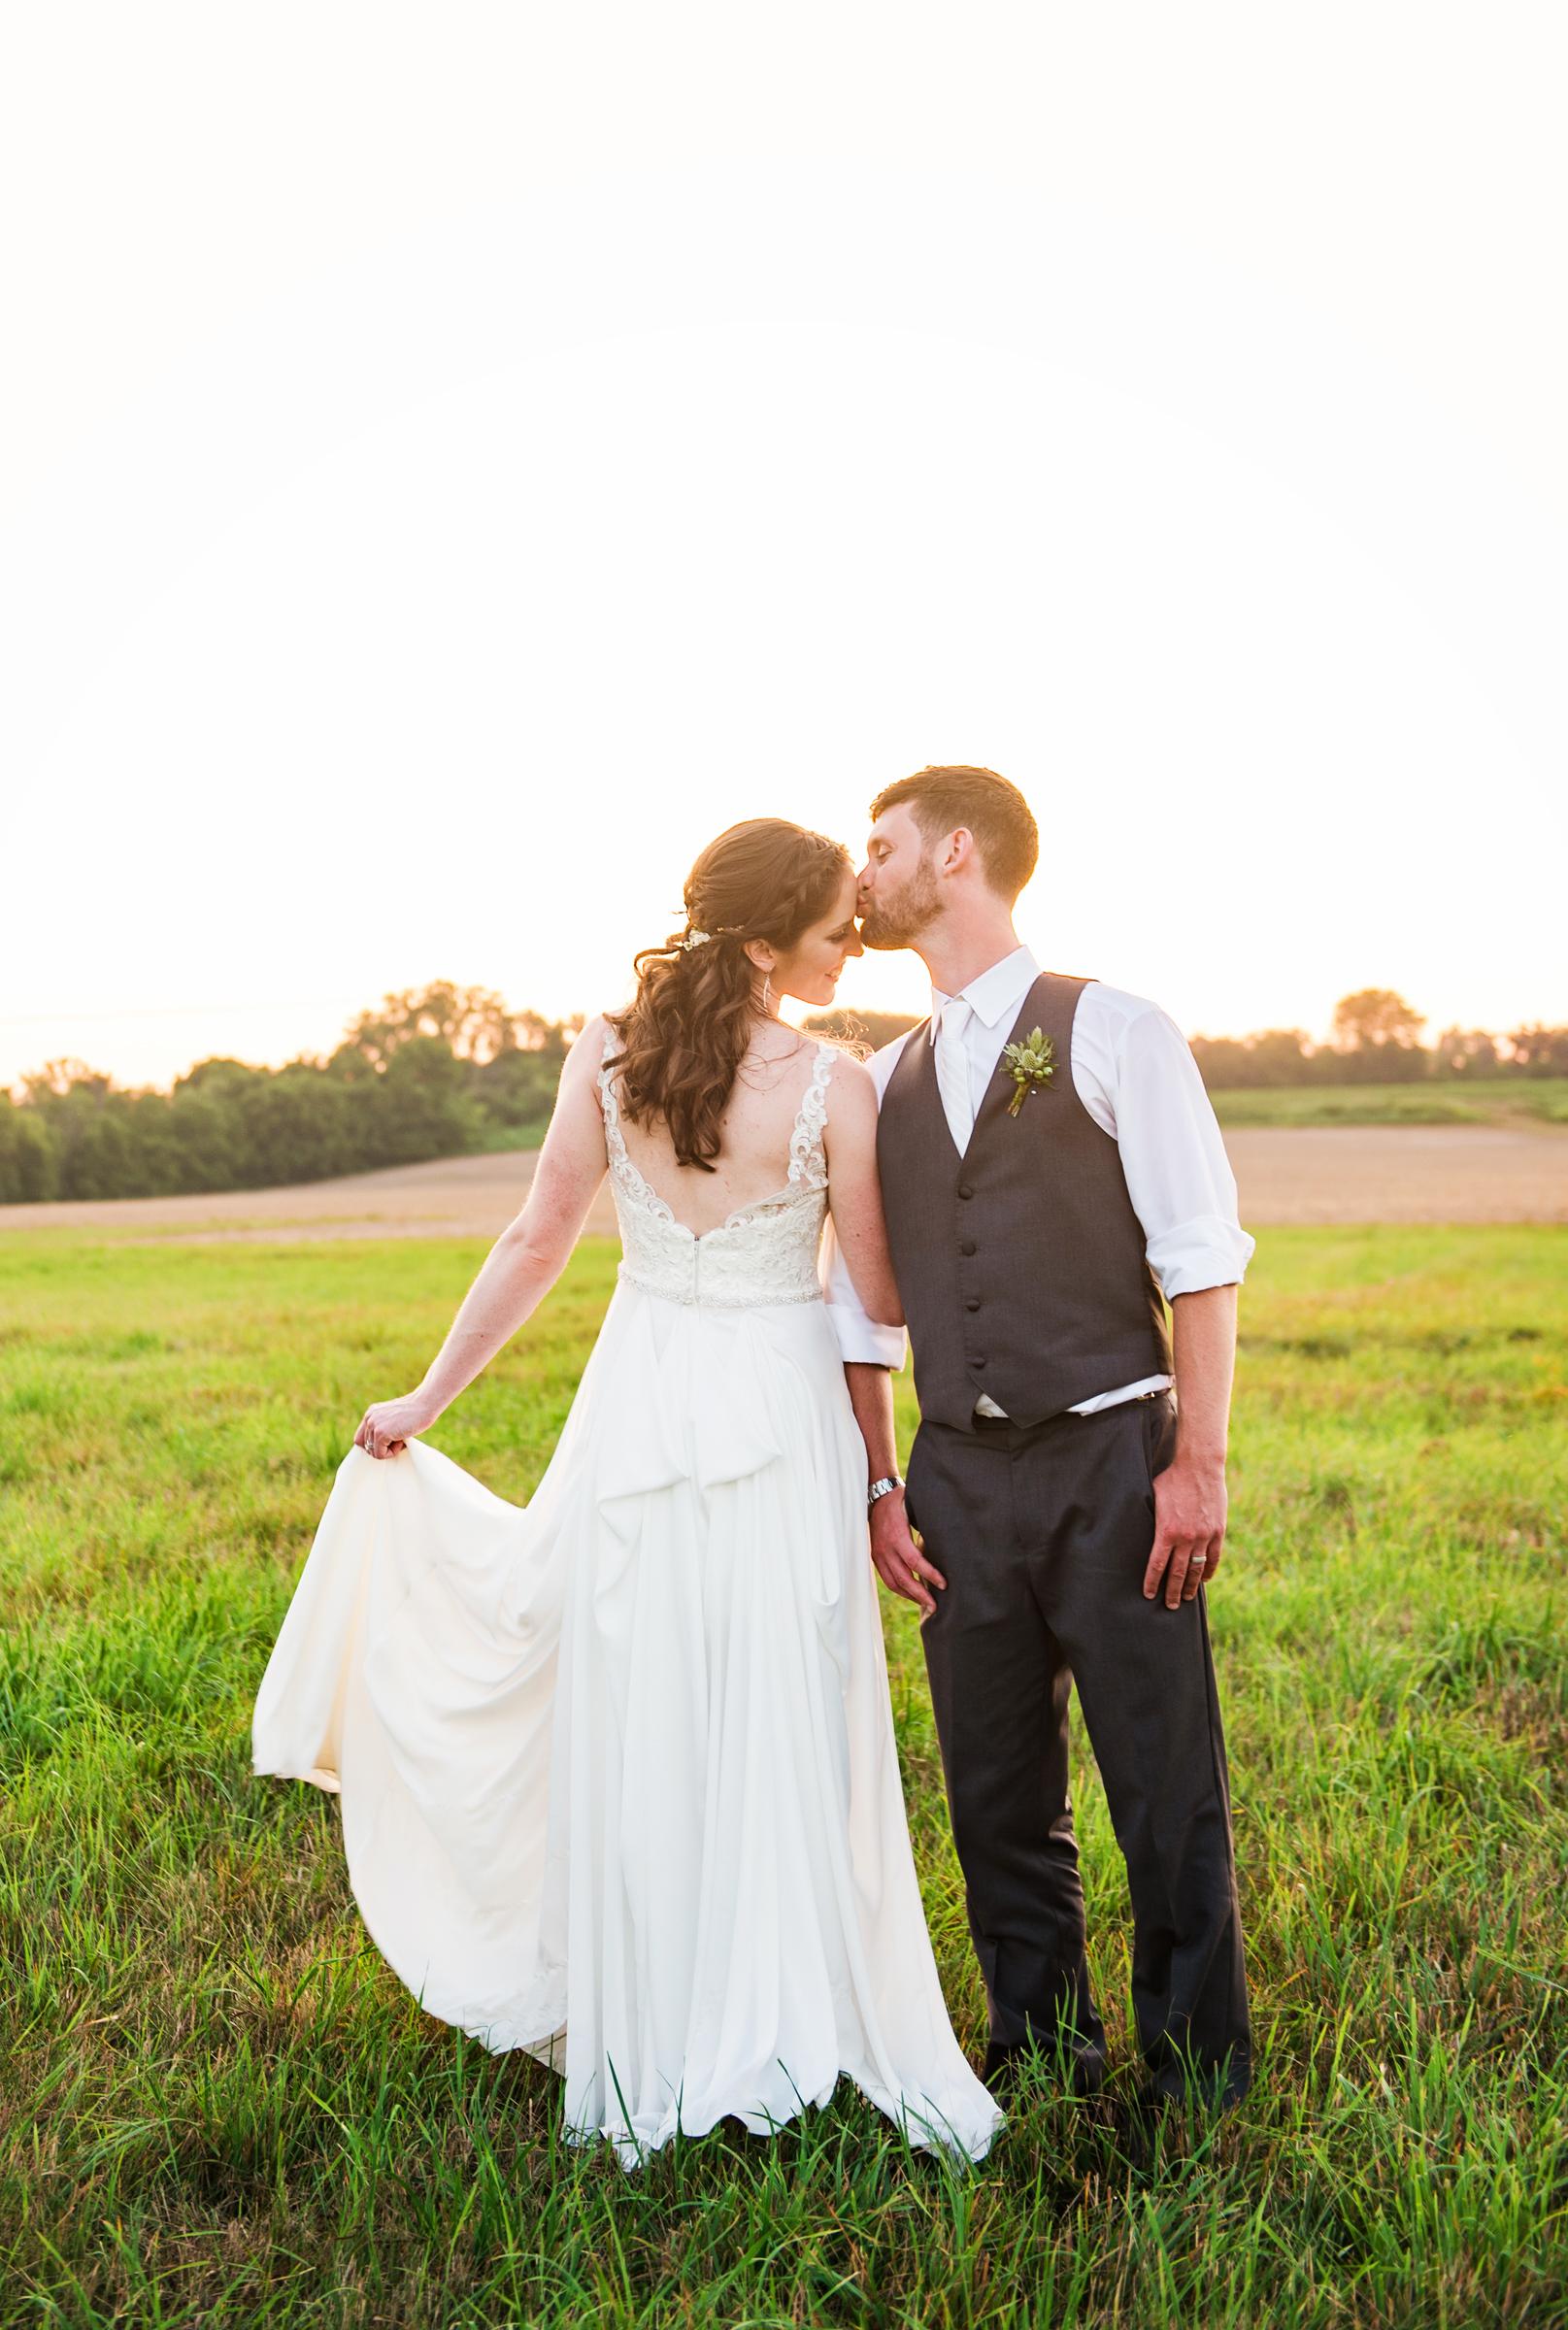 Jerris_Wadsworth_Wedding_Barn_Rochester_Wedding_JILL_STUDIO_Rochester_NY_Photographer_DSC_3094.jpg